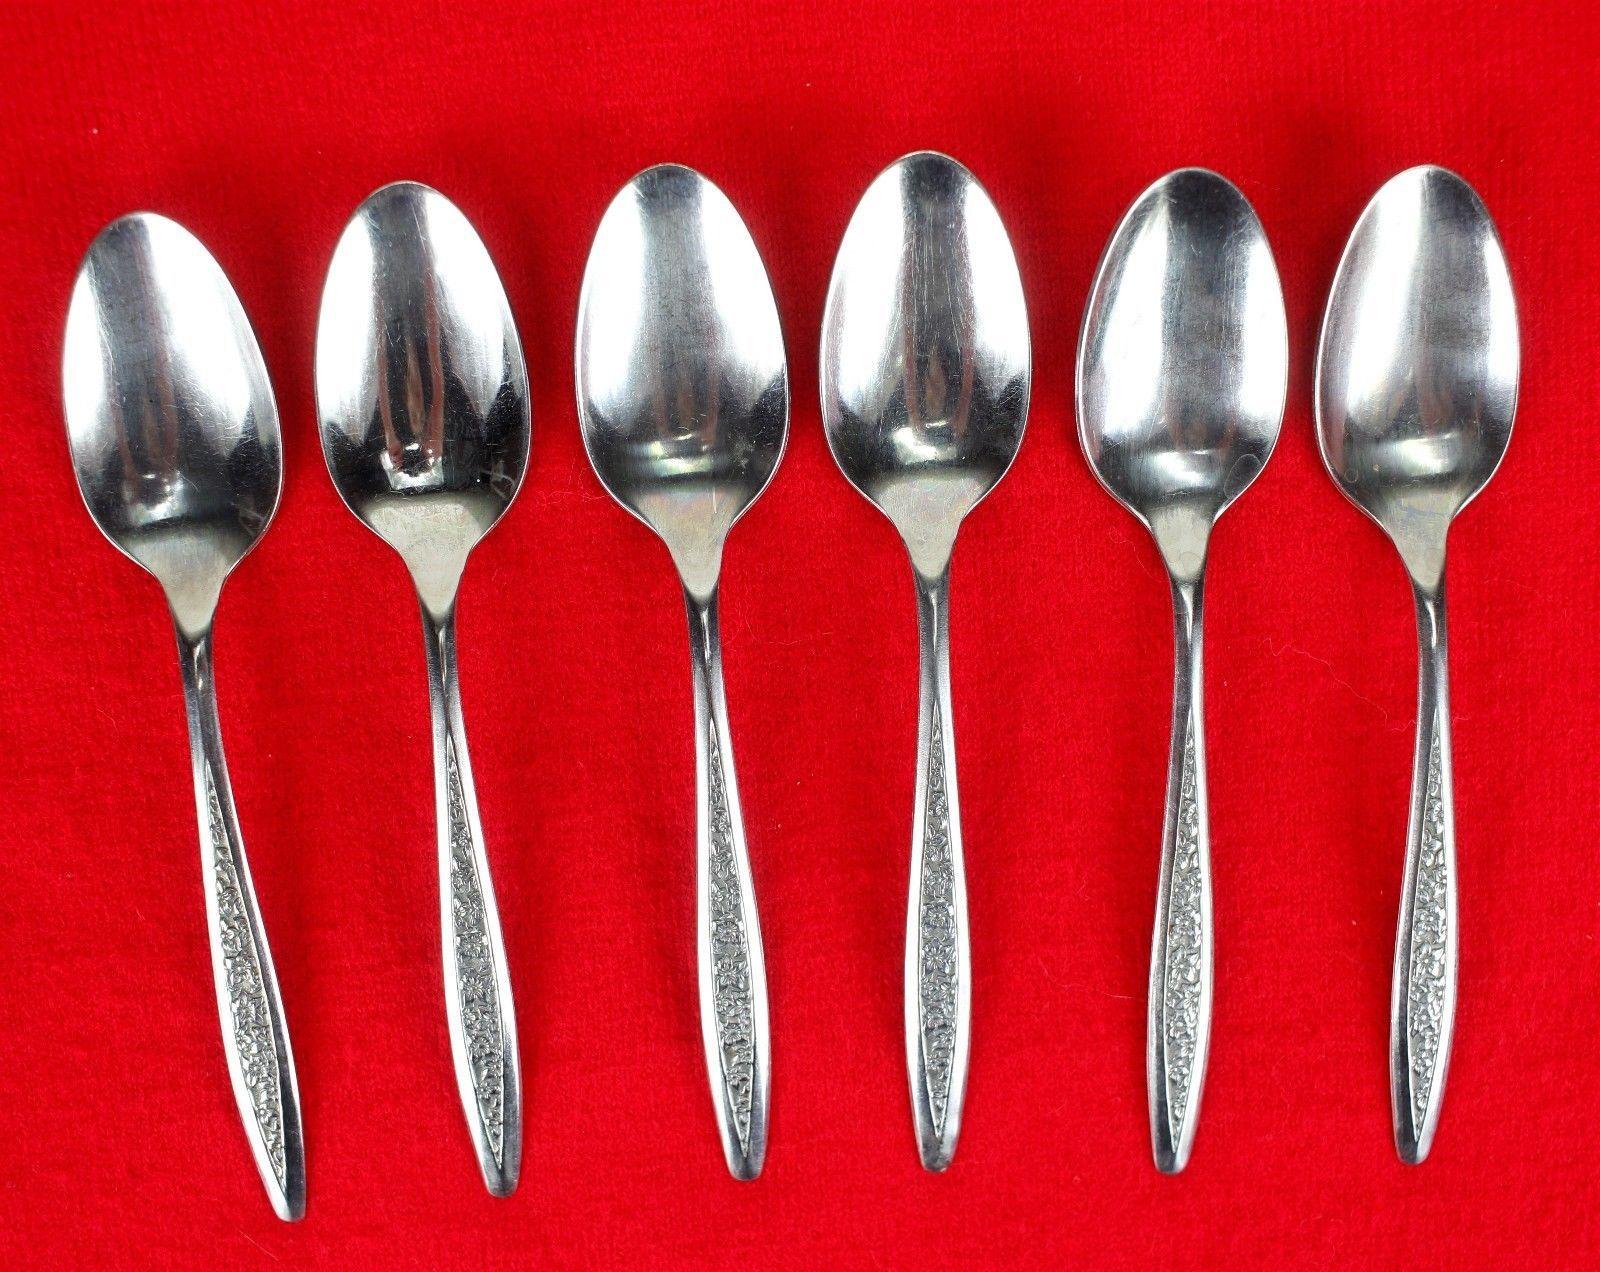 6X Teaspoons Superior International Silver Petal Lane Stainless Flatware Spoon